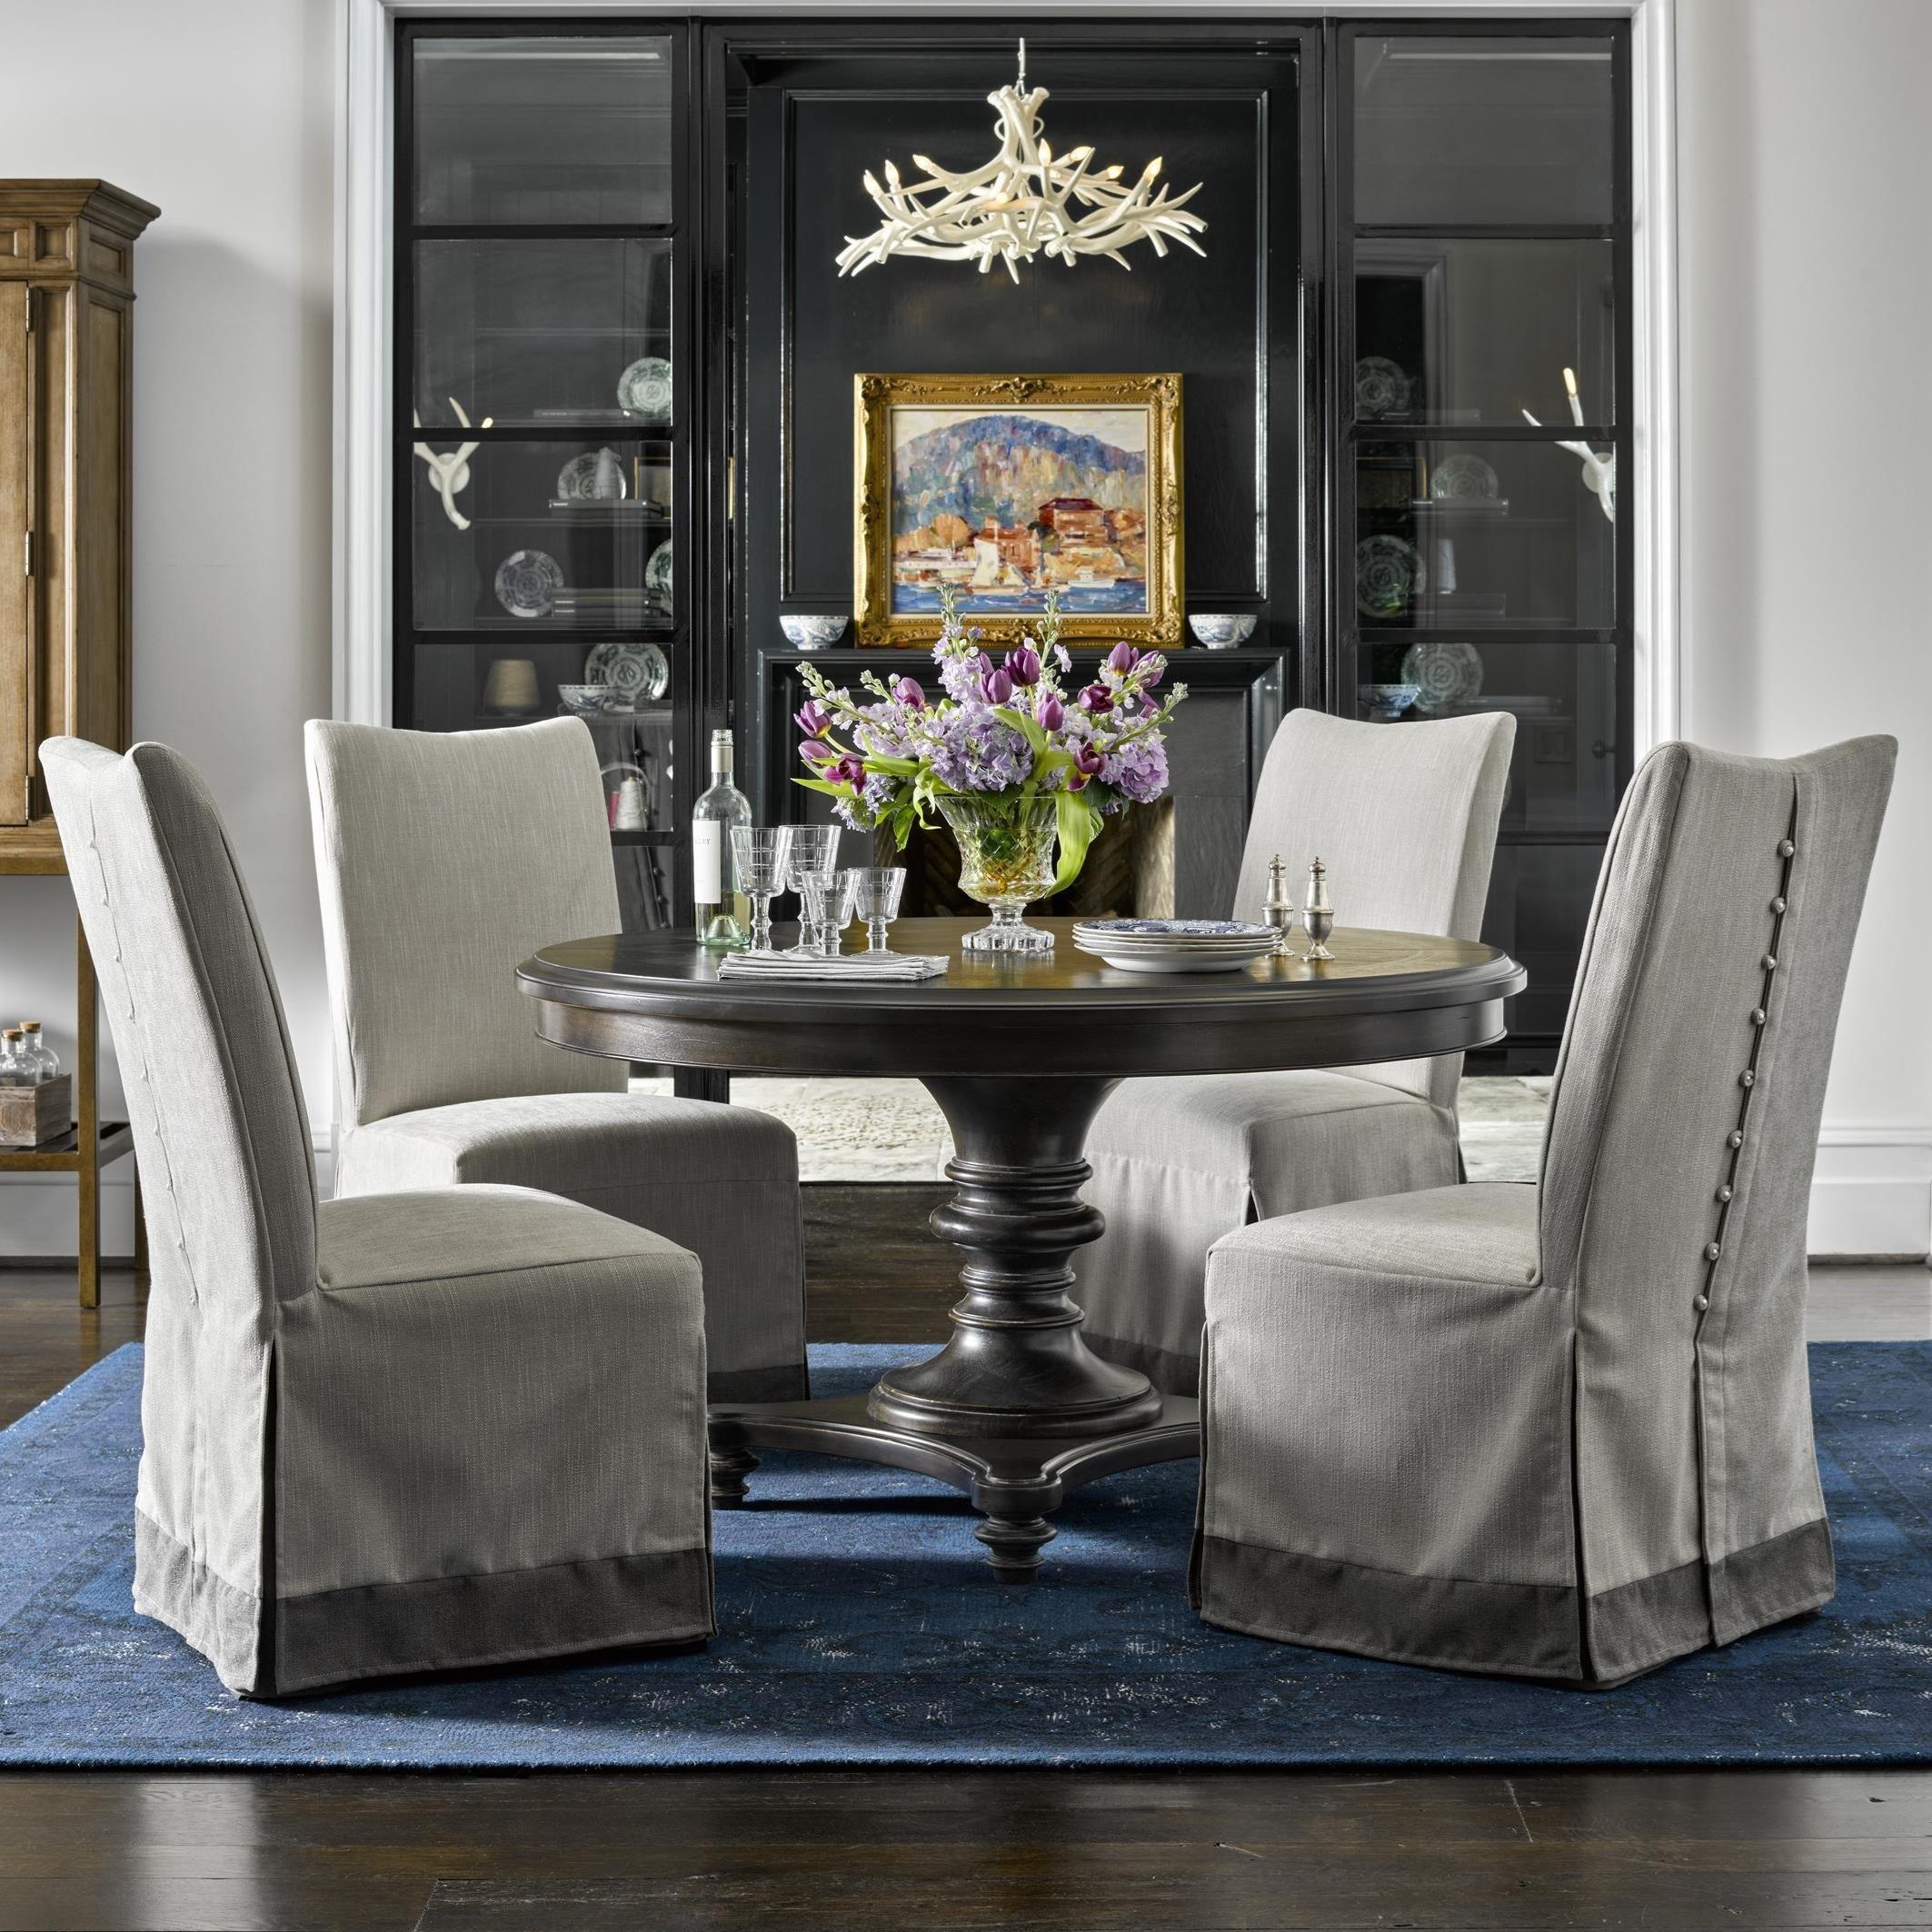 Universal Dining Room Furniture: Universal Postscript 5 Piece Round Dining Set With